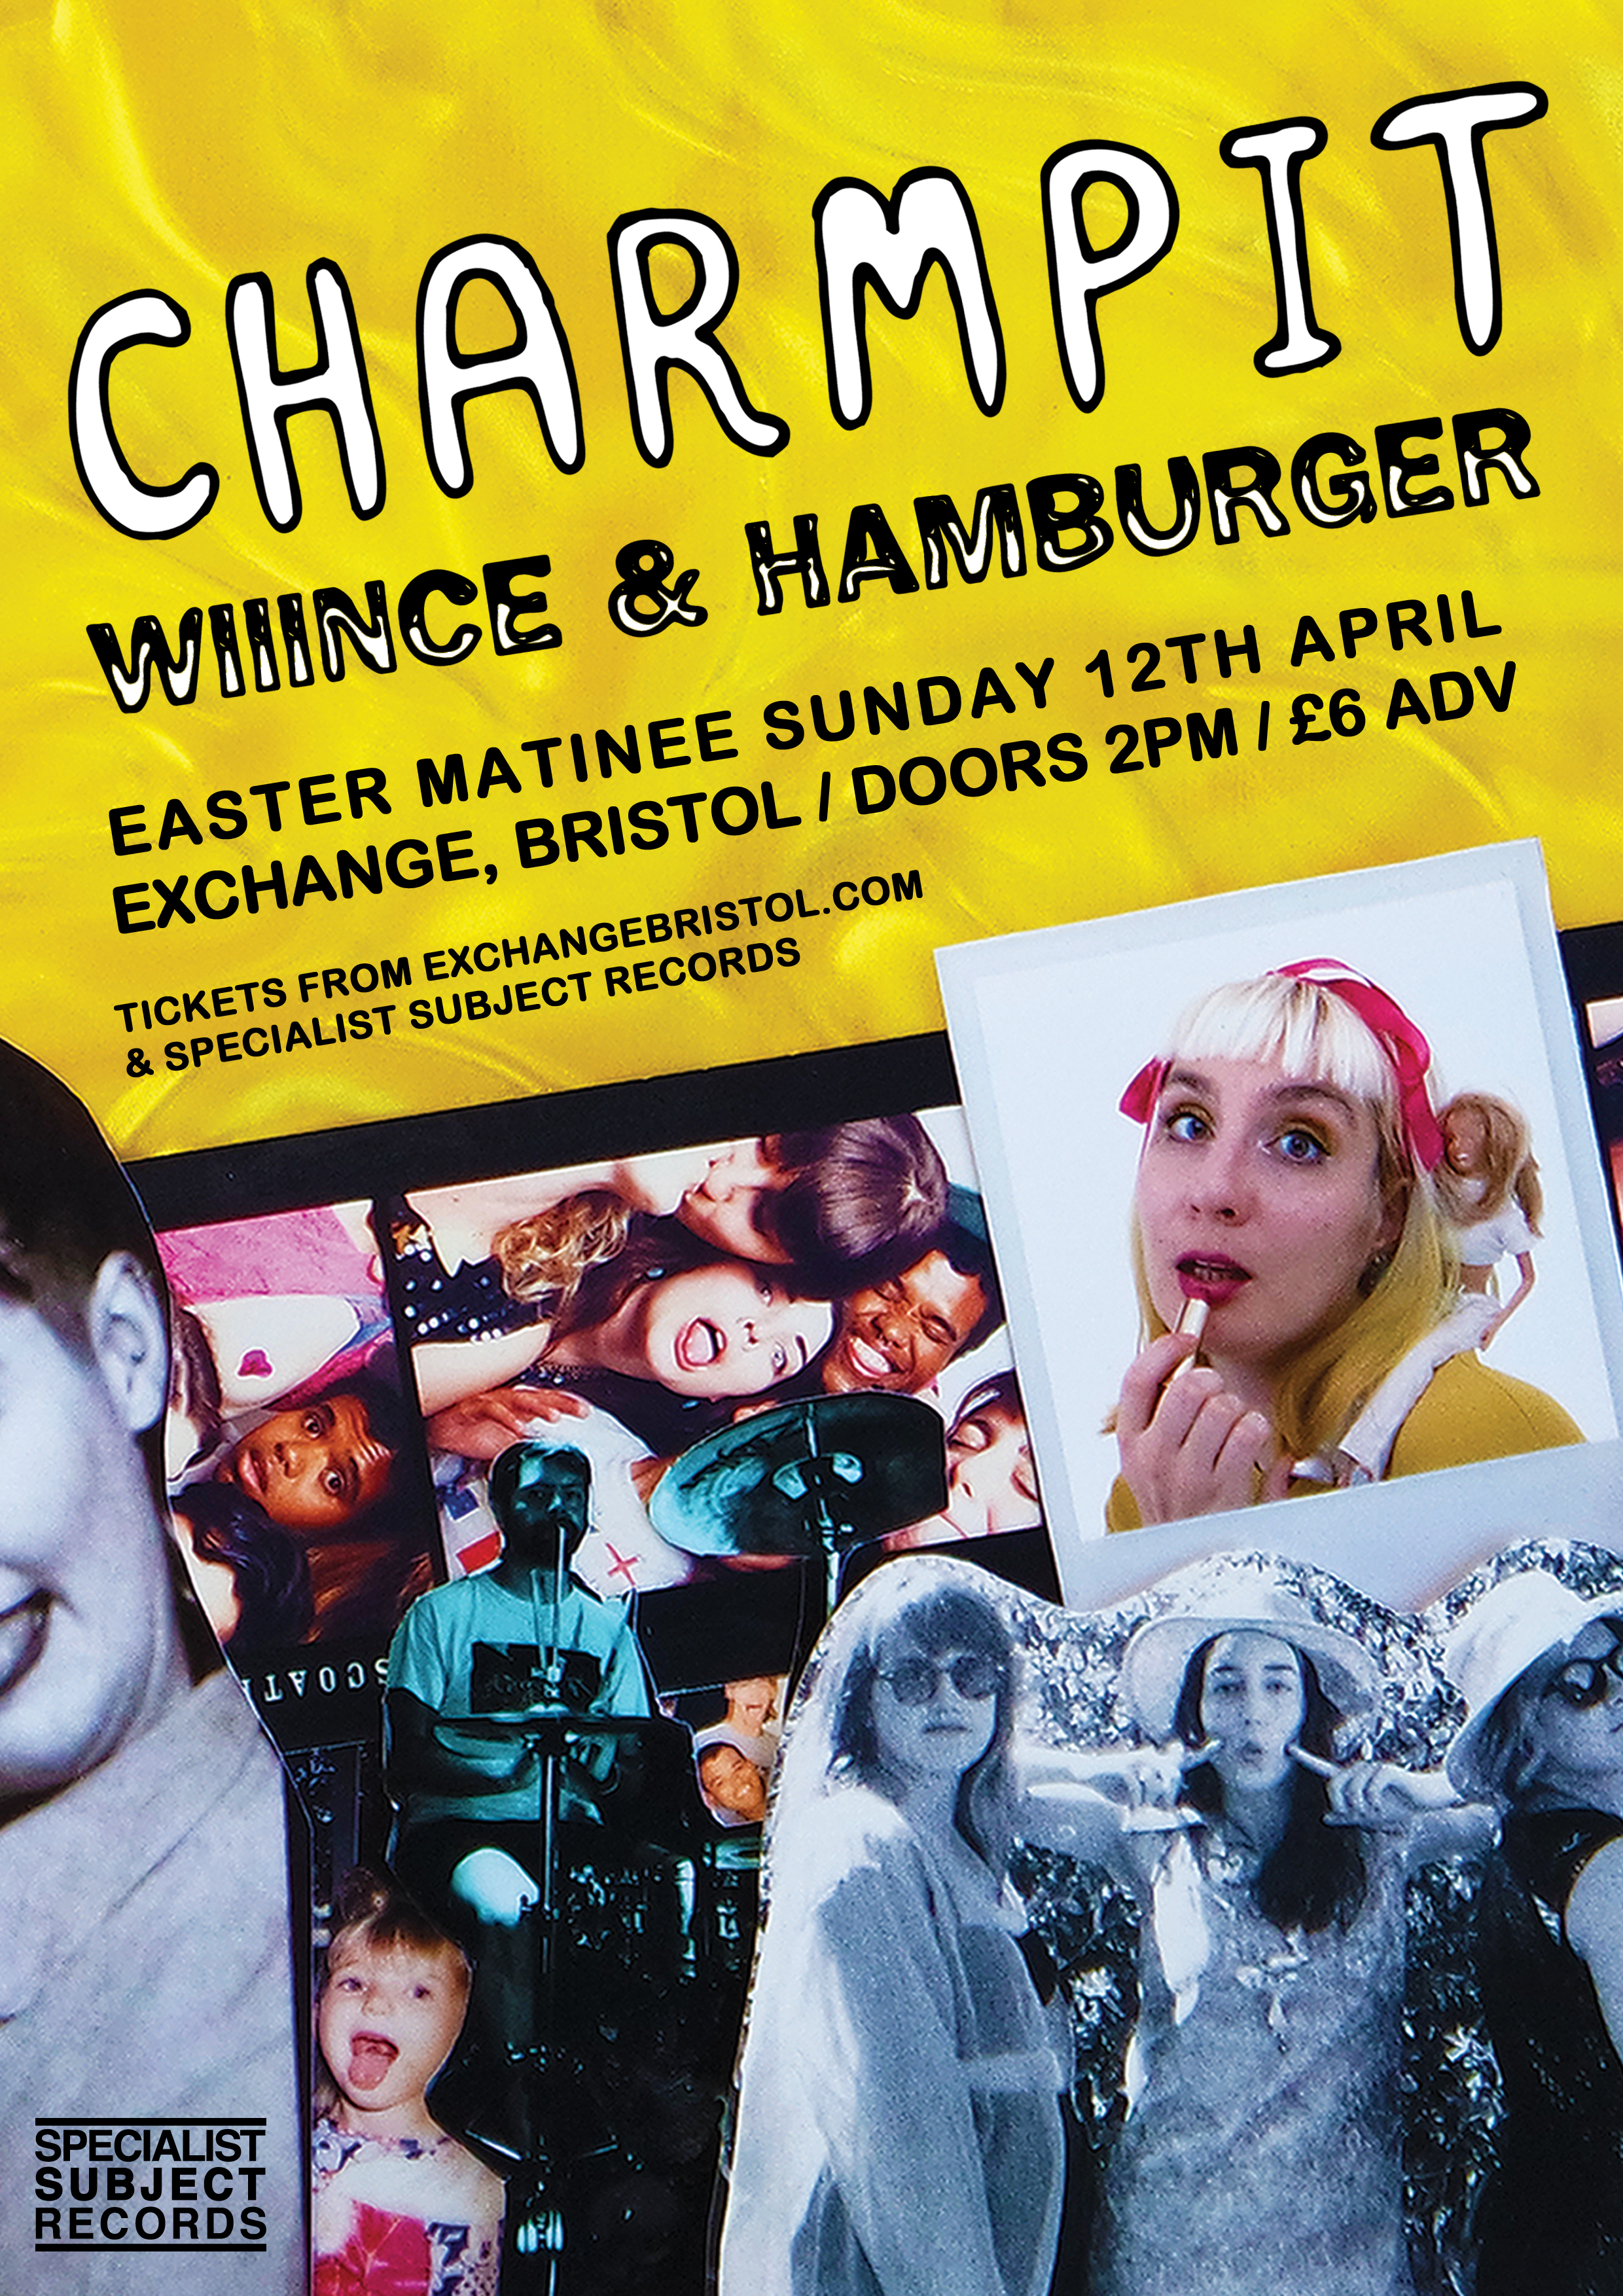 Charmpit, Wiiince & Hamburger